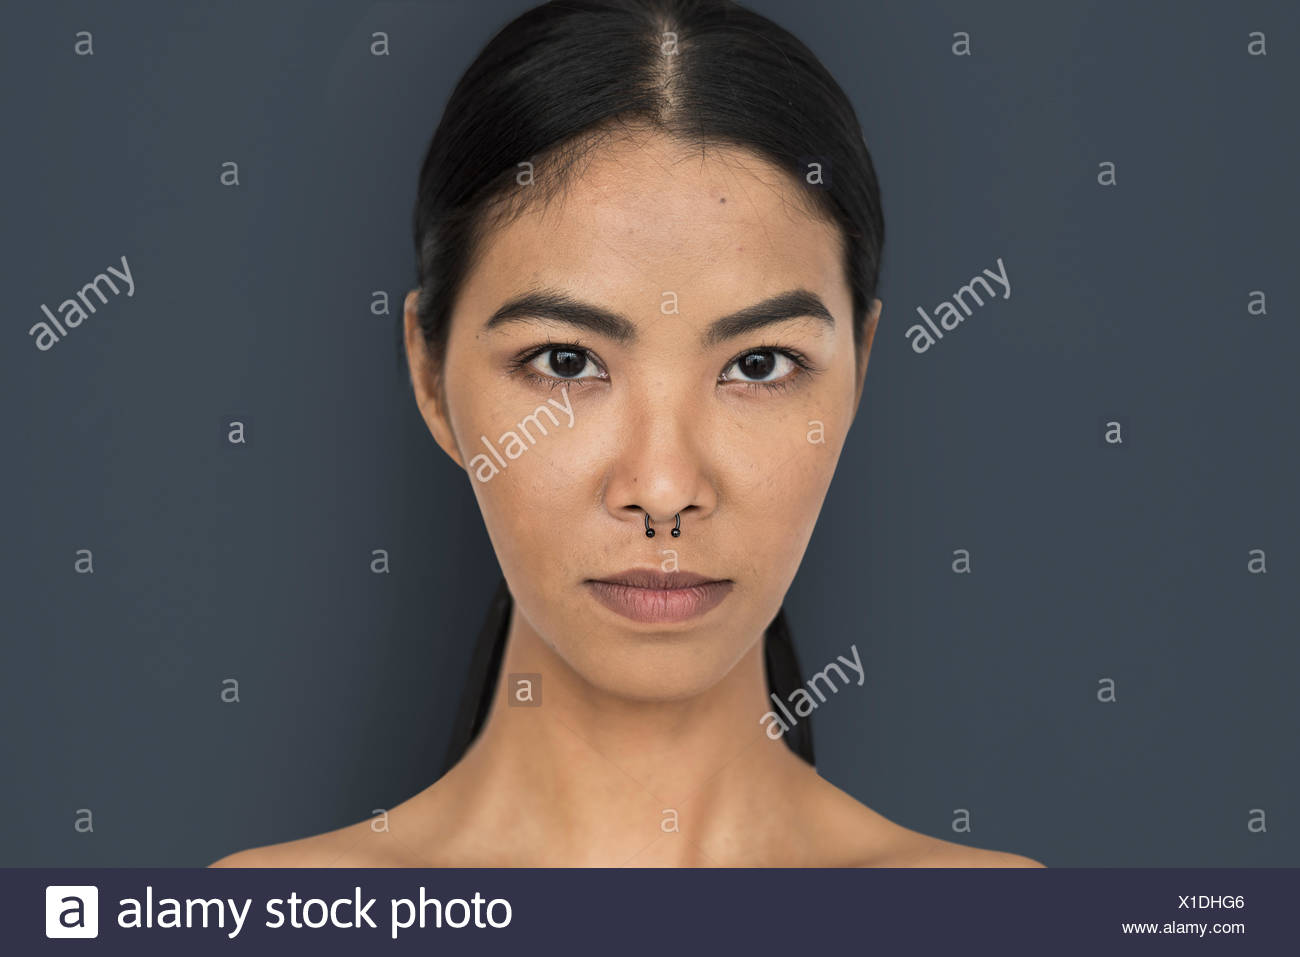 Woman Pierced Nose Ring Confidence Self Esteem Portrait Stock Photo